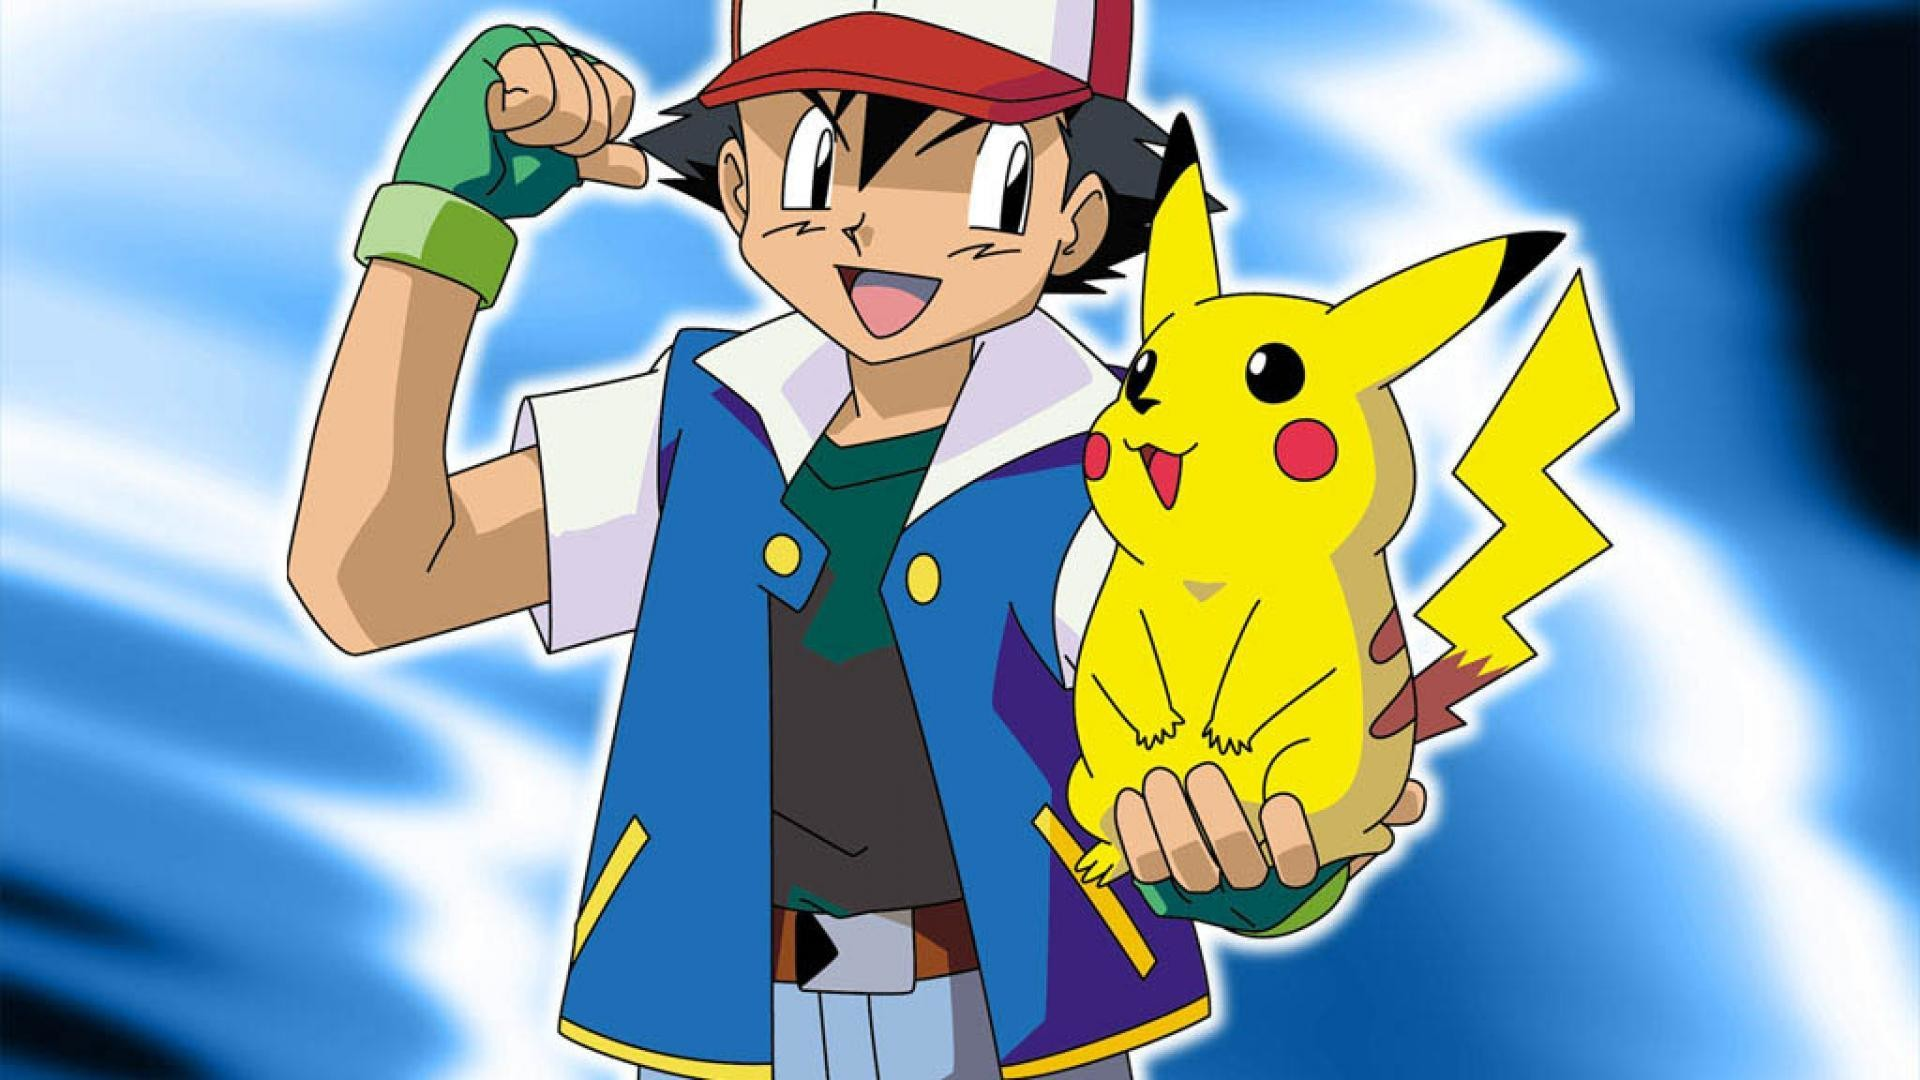 Download Pokemon Pikachu Images Wallpaper   Full HD .